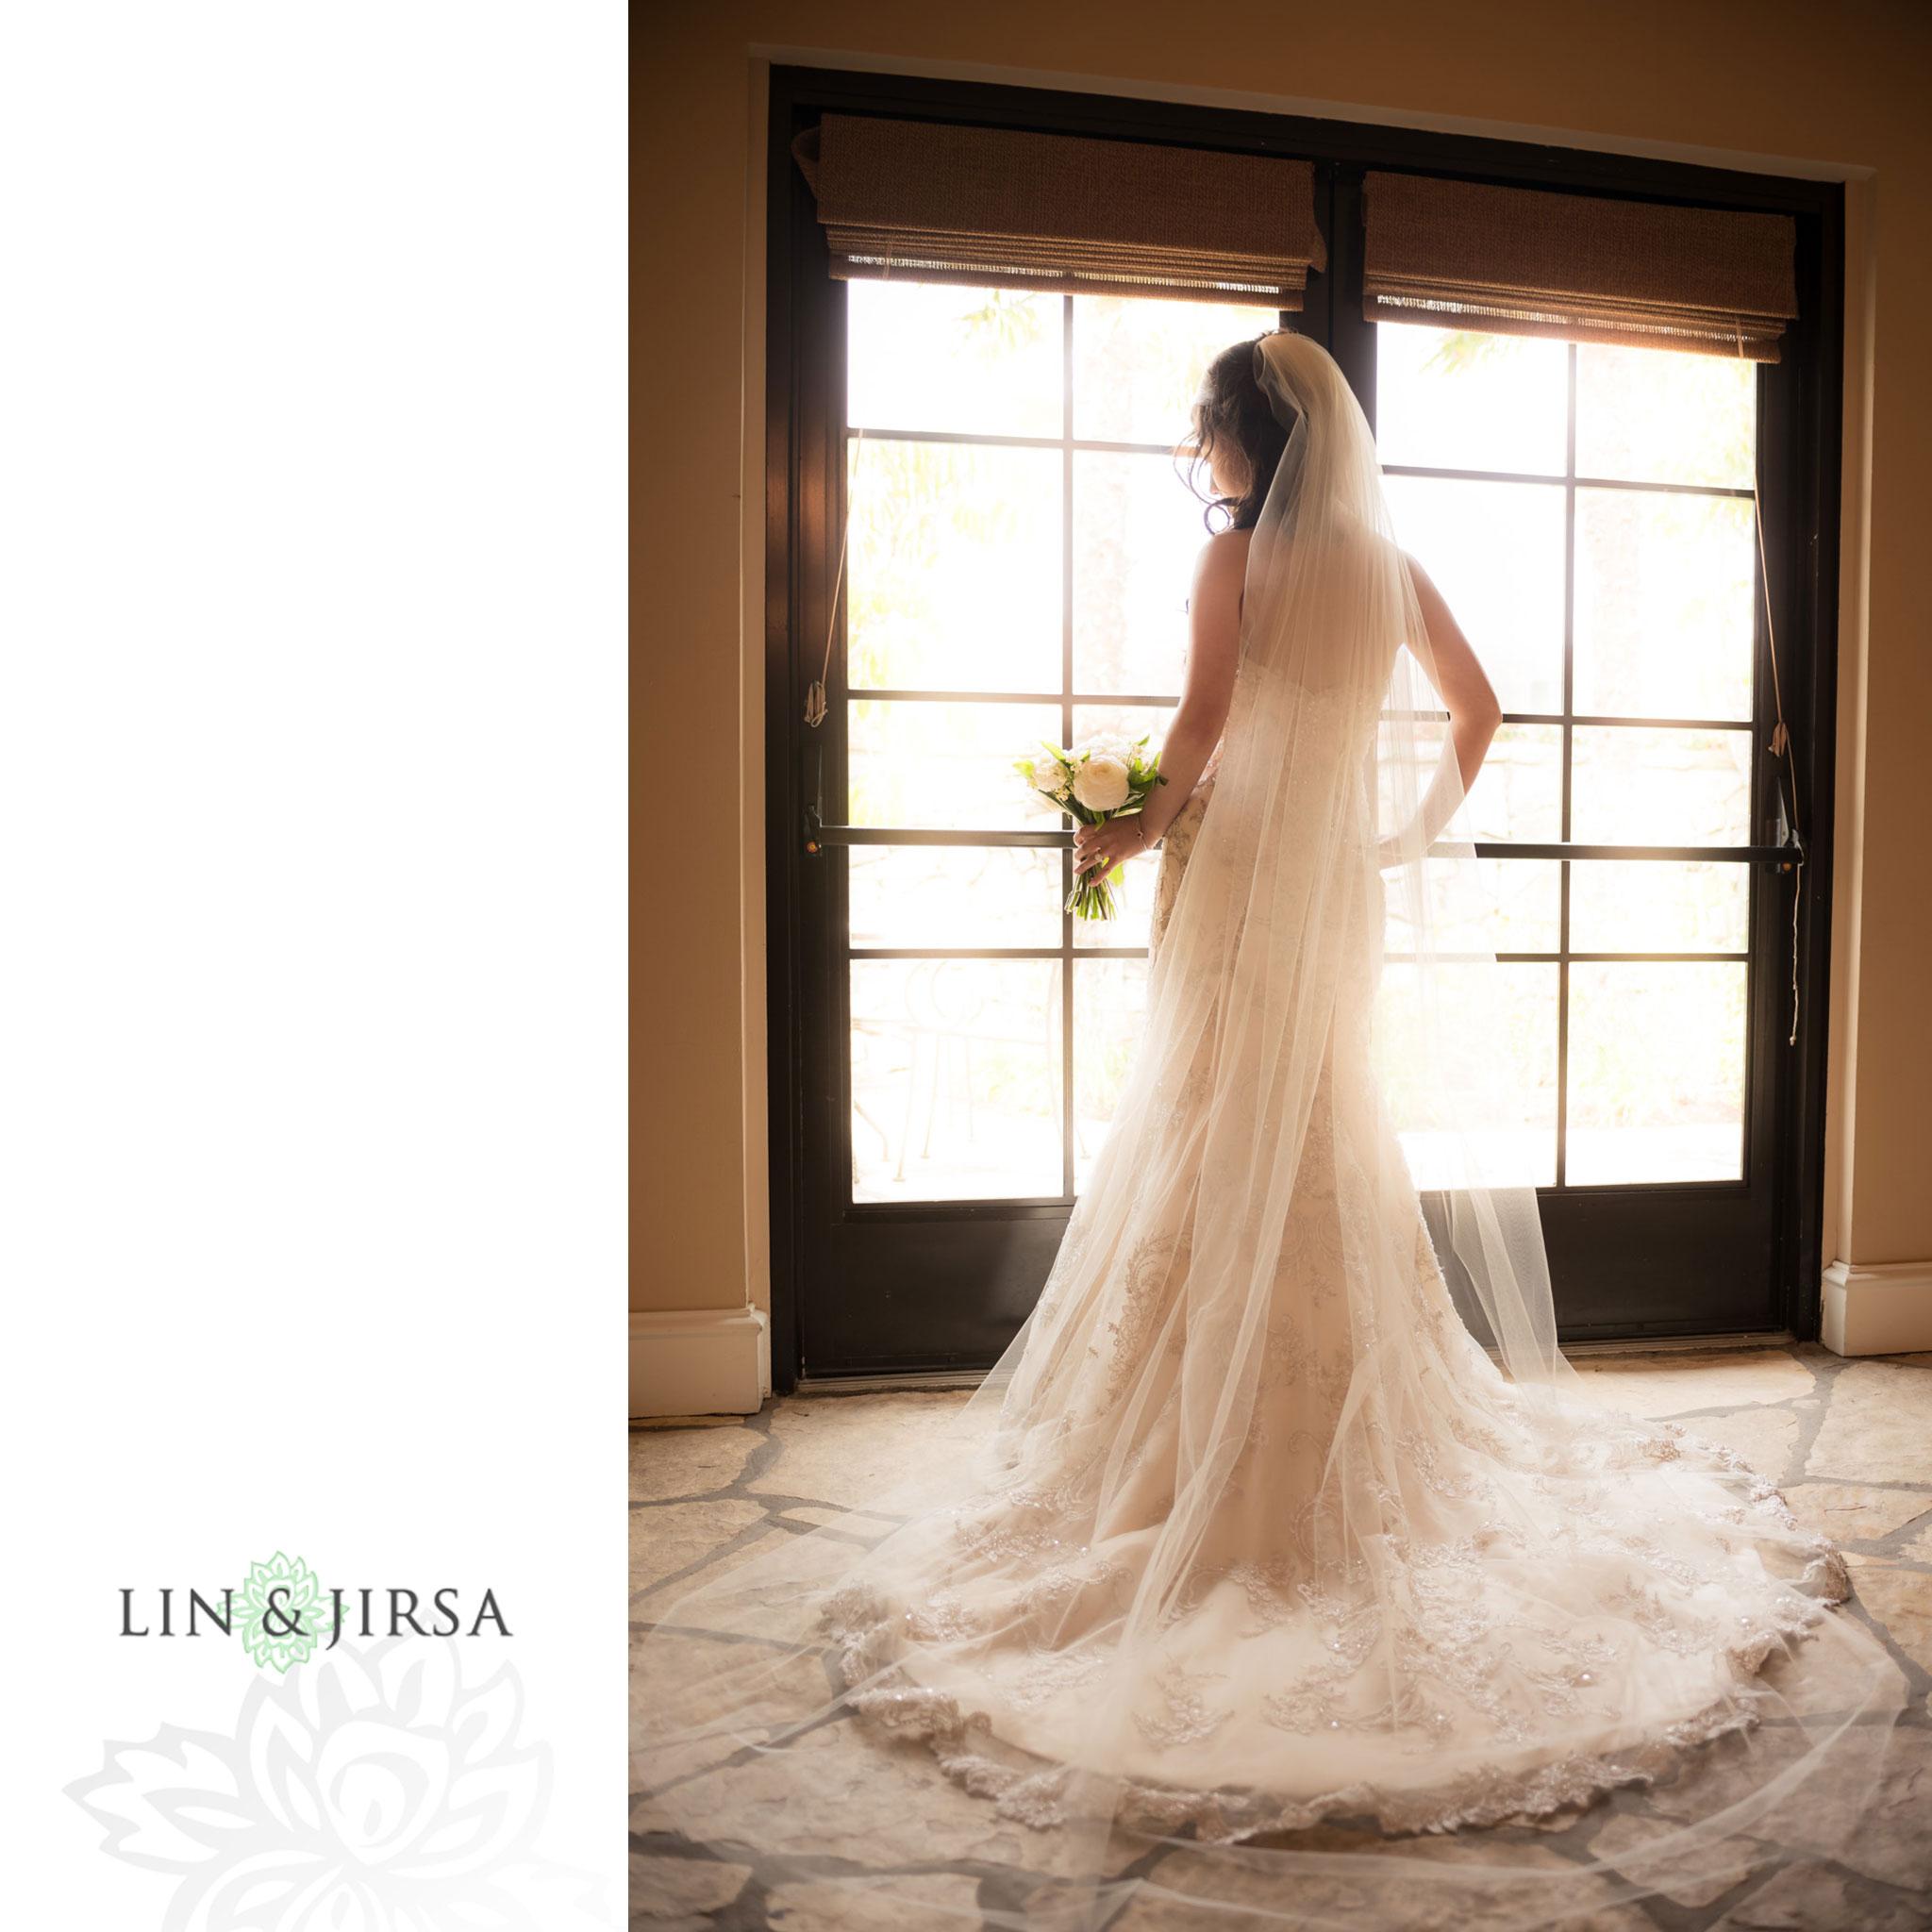 04 trump national golf club rancho palos verdes wedding bride photography